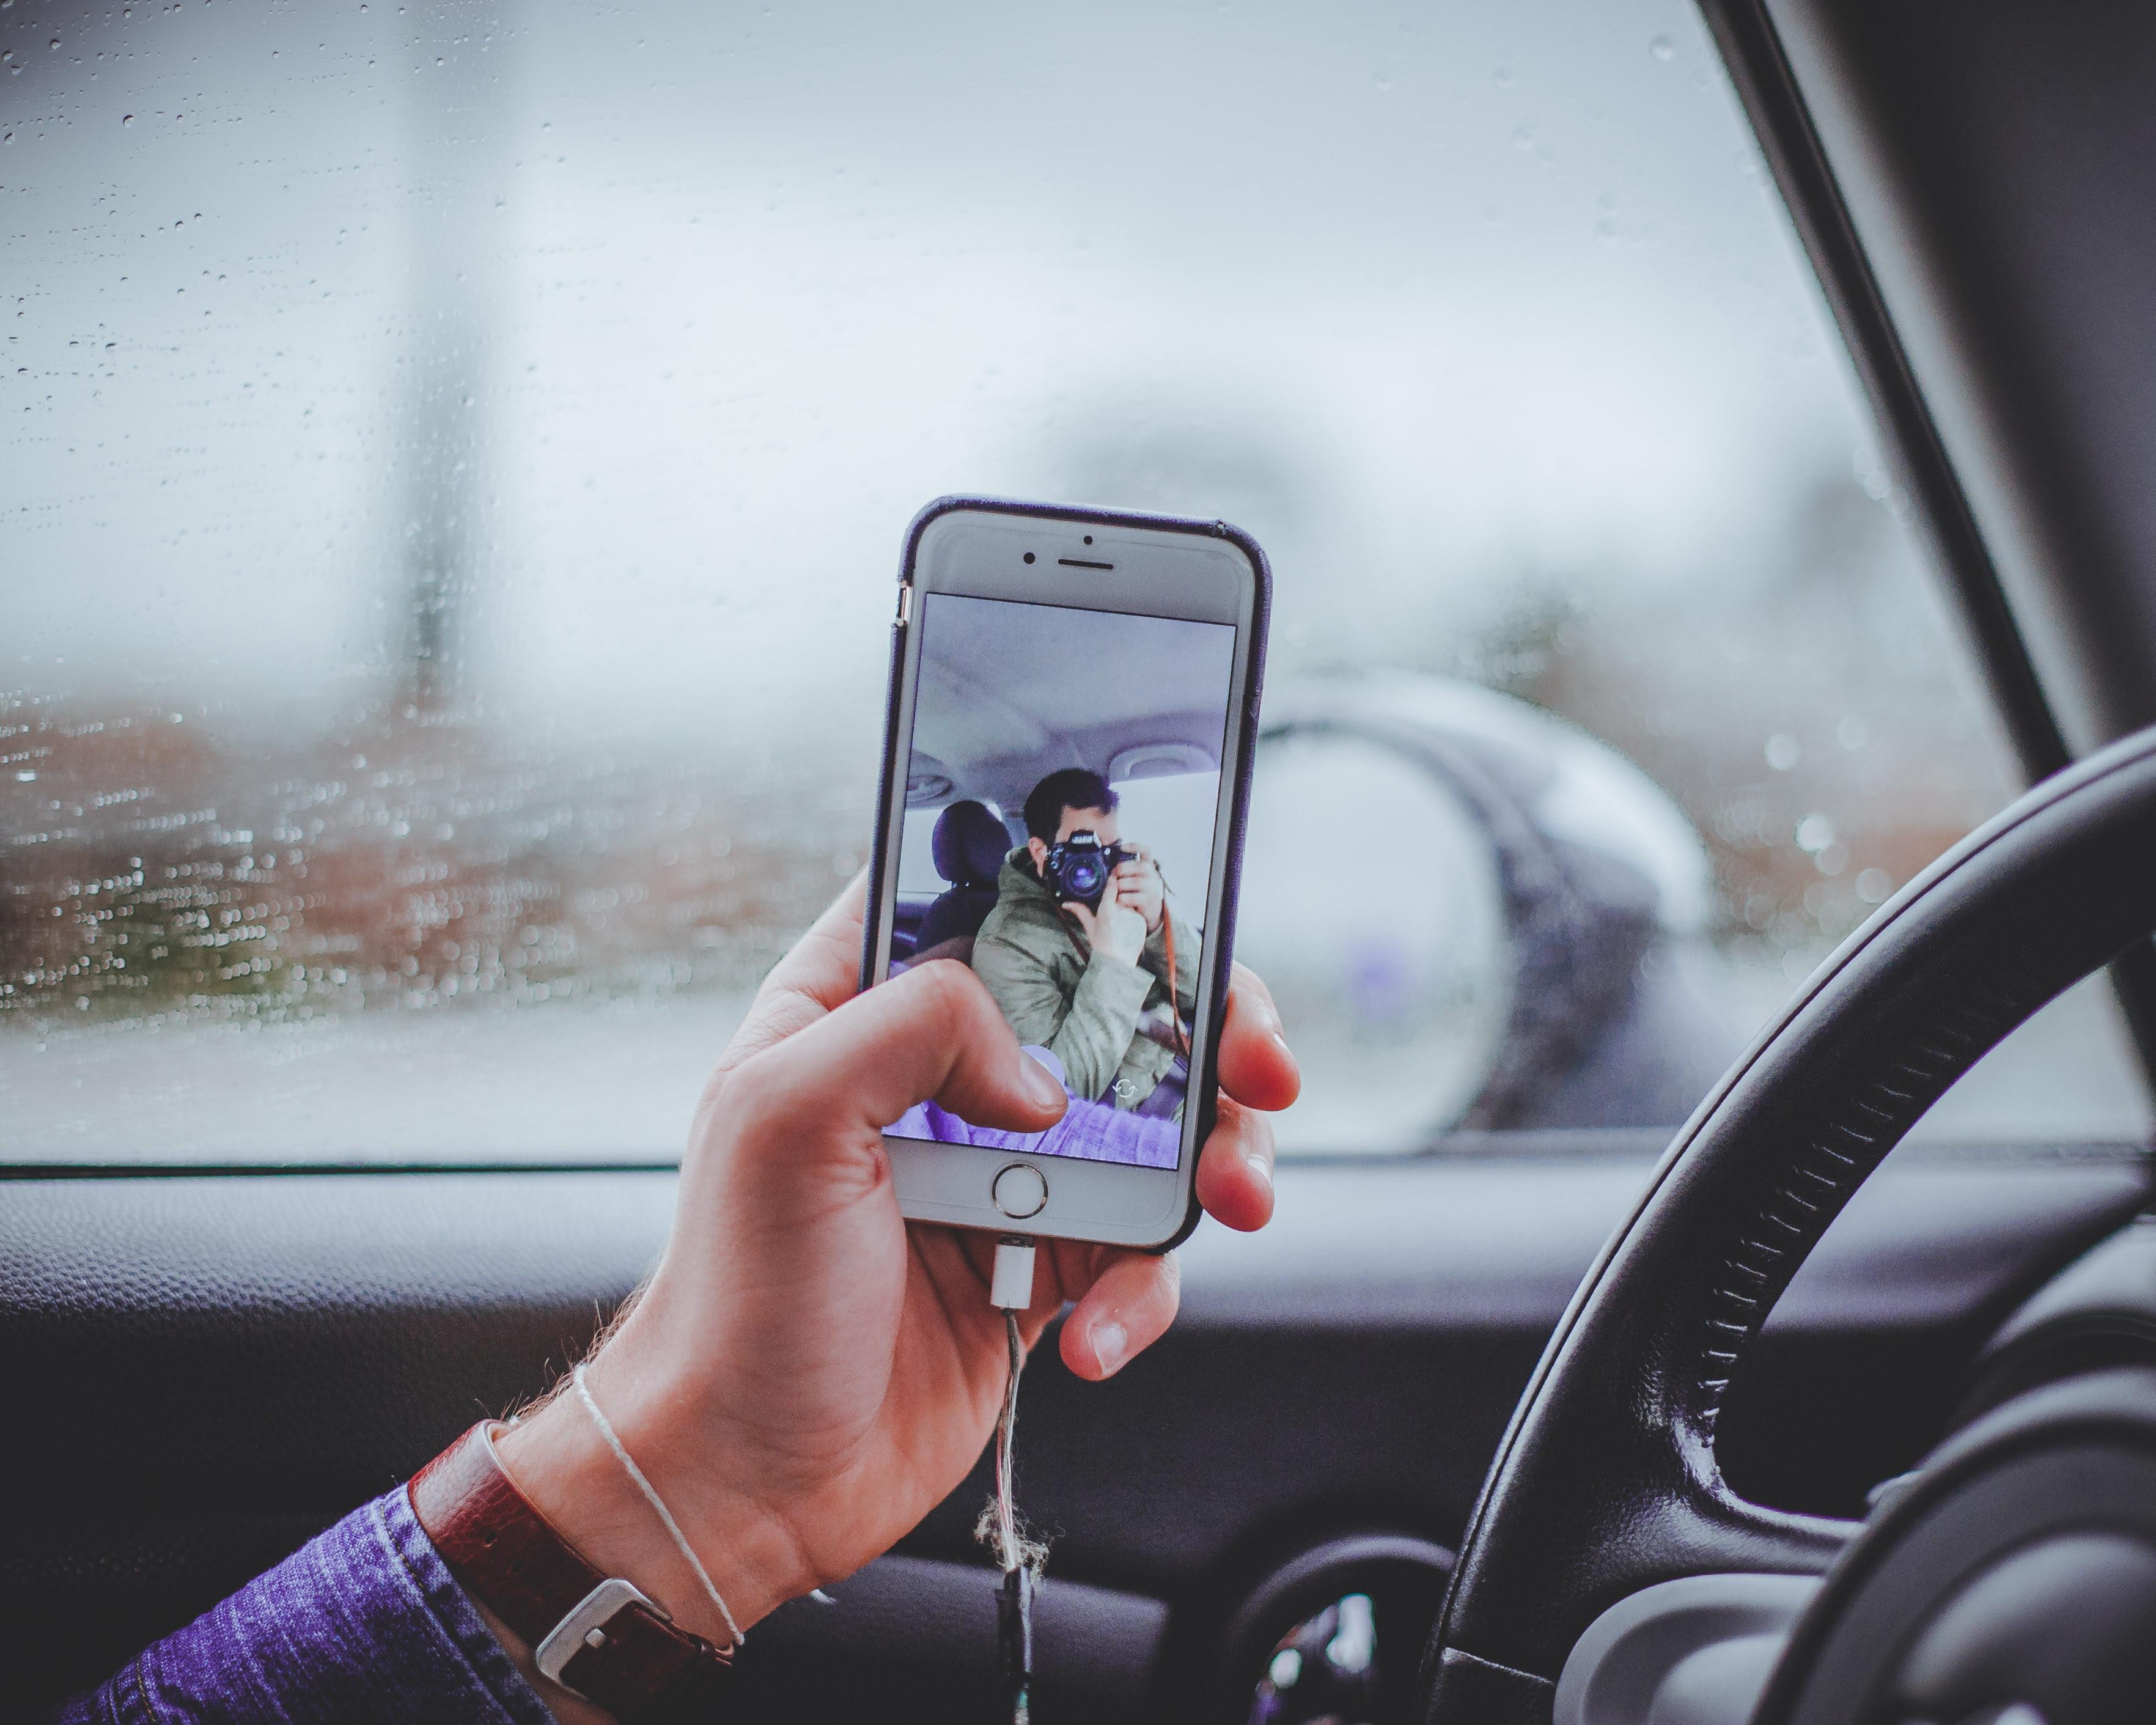 Apakah ada diantara Bung yang kini masih getol memakai aplikasi kencan  Bukan Profil Bung yang Tak Asyik, tetapi Cara Chatting Bung yang Kurang Menarik